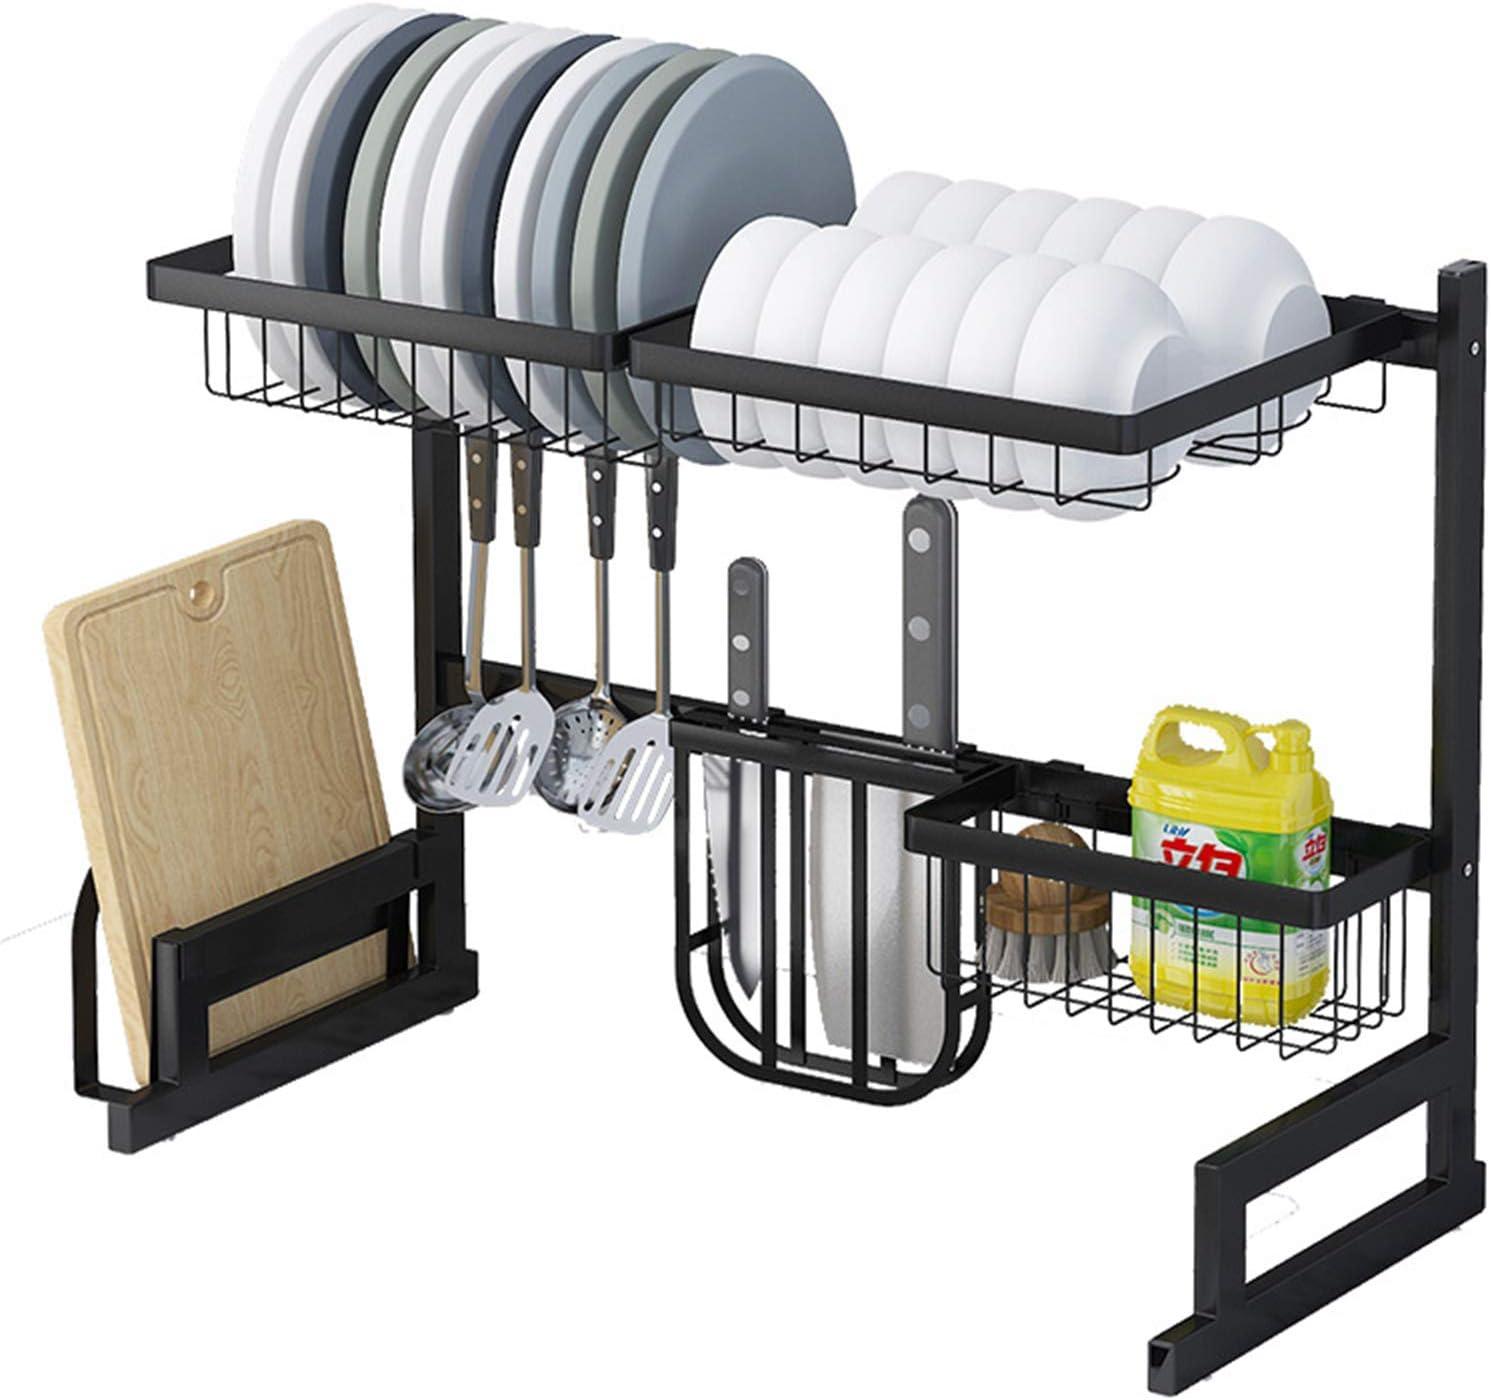 BZLEK Free Shipping New Shipping Free Shipping New Dish Drying Rack Kitchen Organizer and Sink Ra